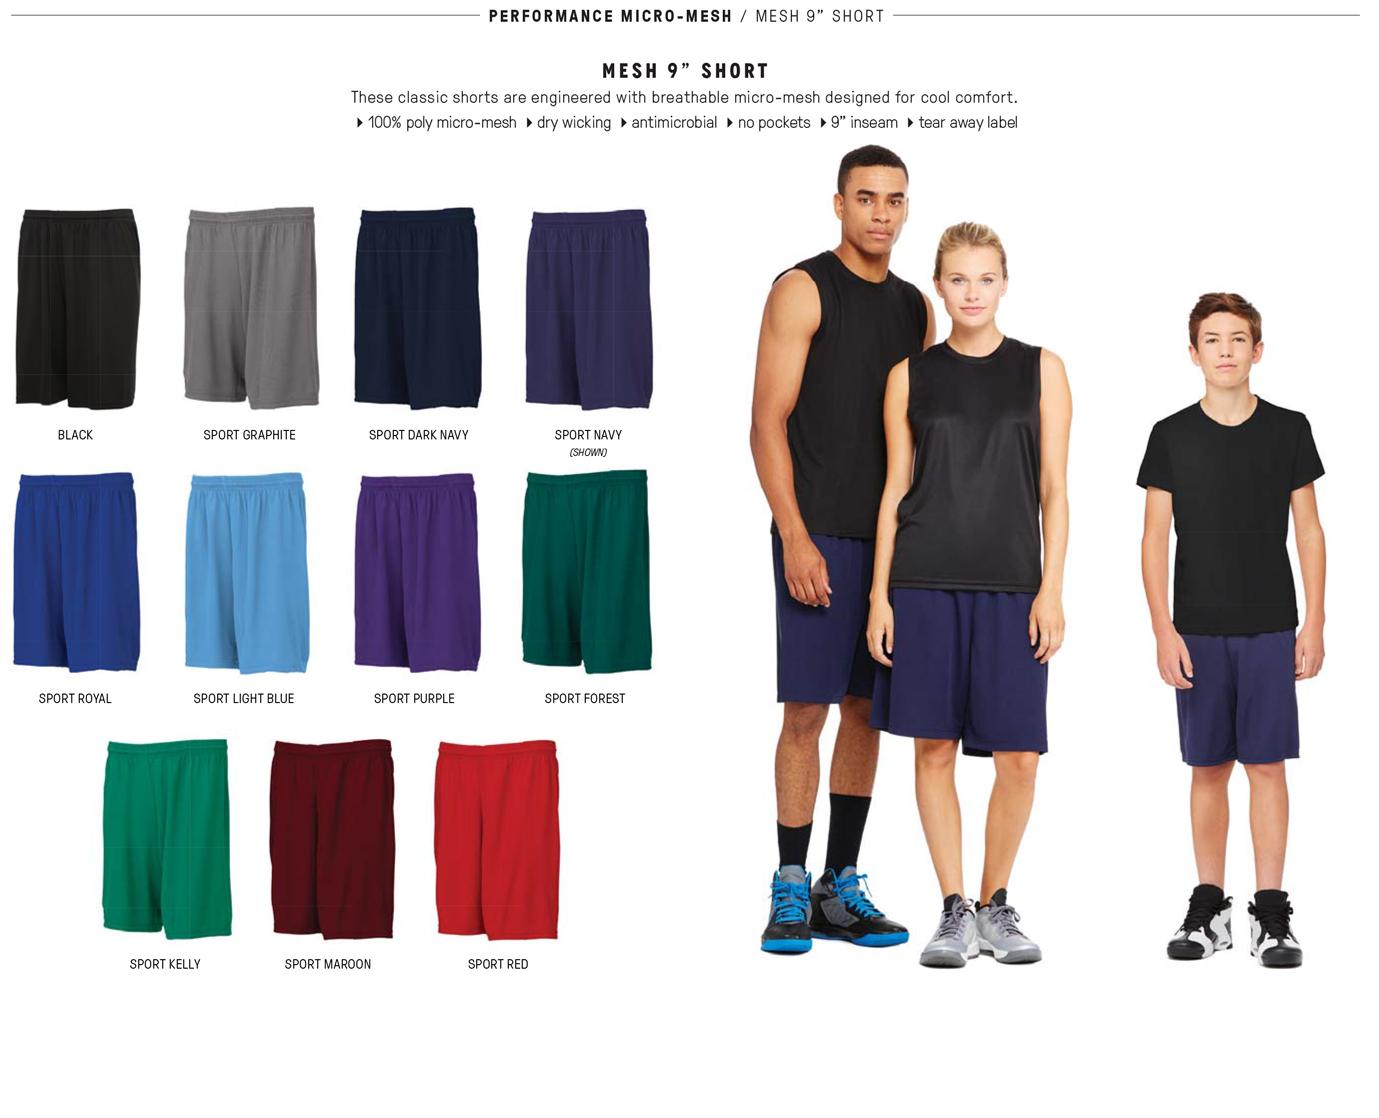 Ultimate Shorts